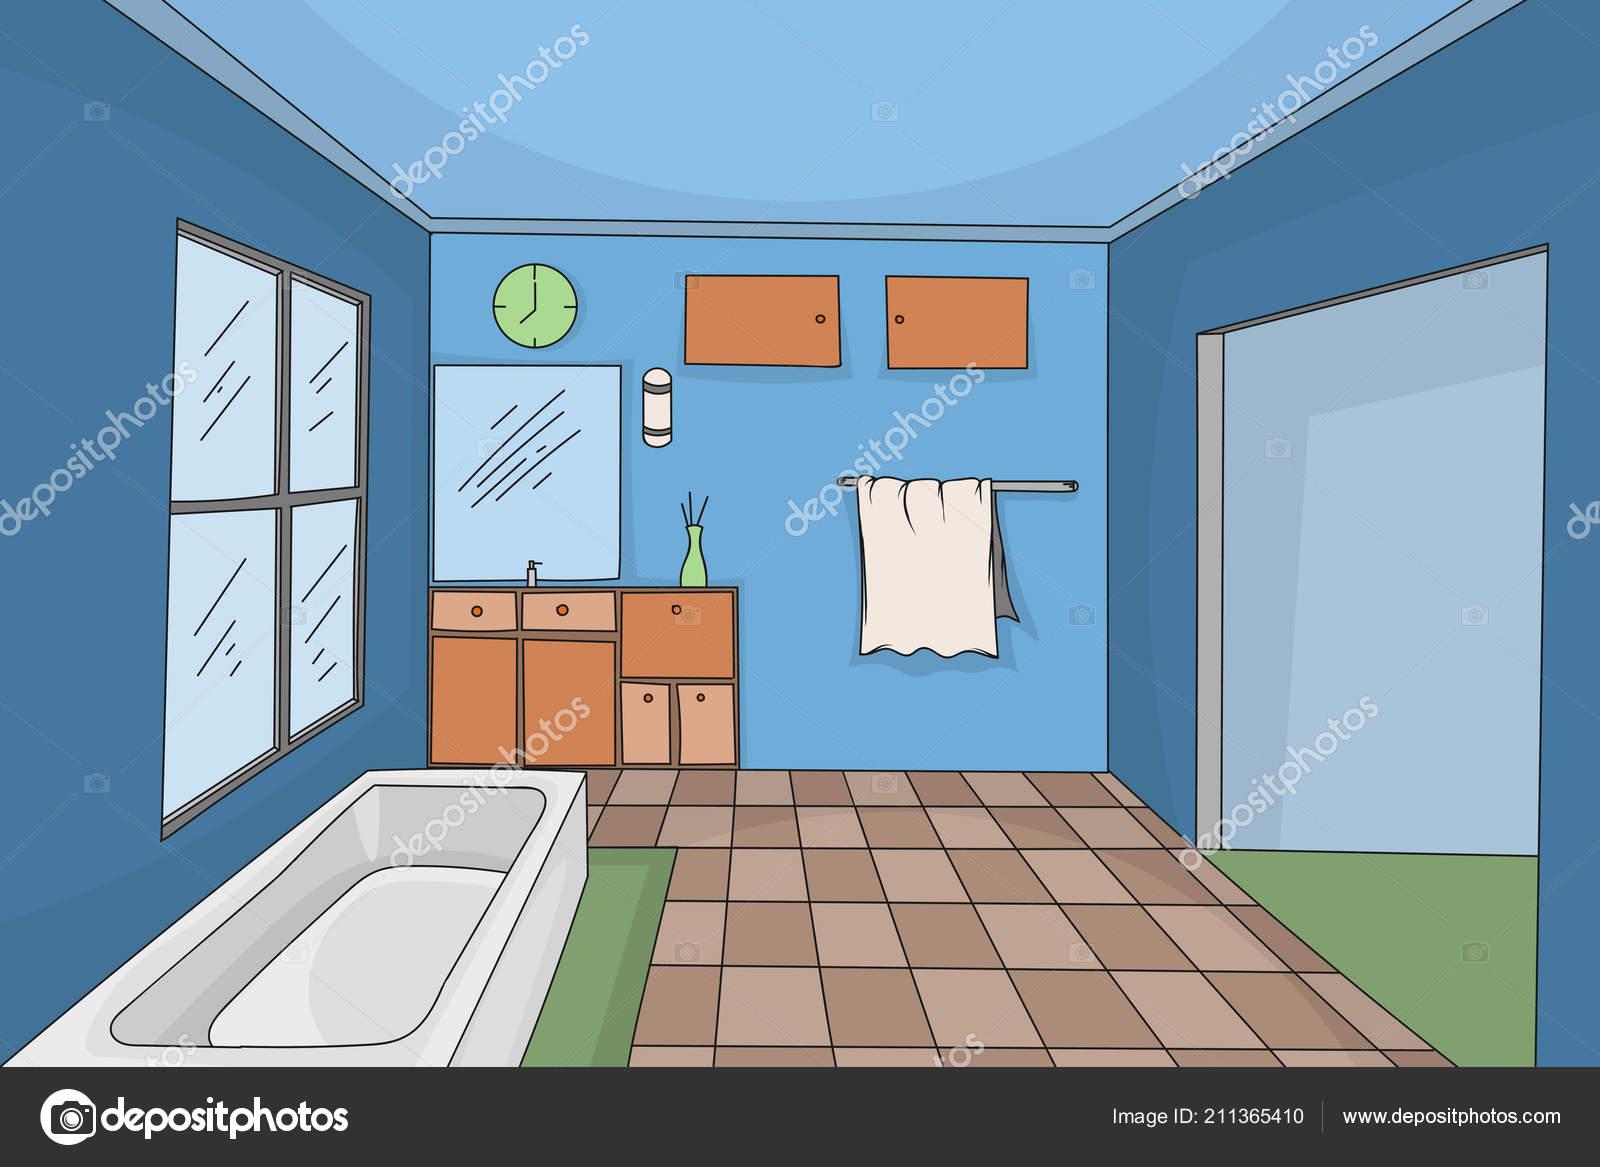 Bathroom Interior Colors Style Hand Drawing Scene Vector